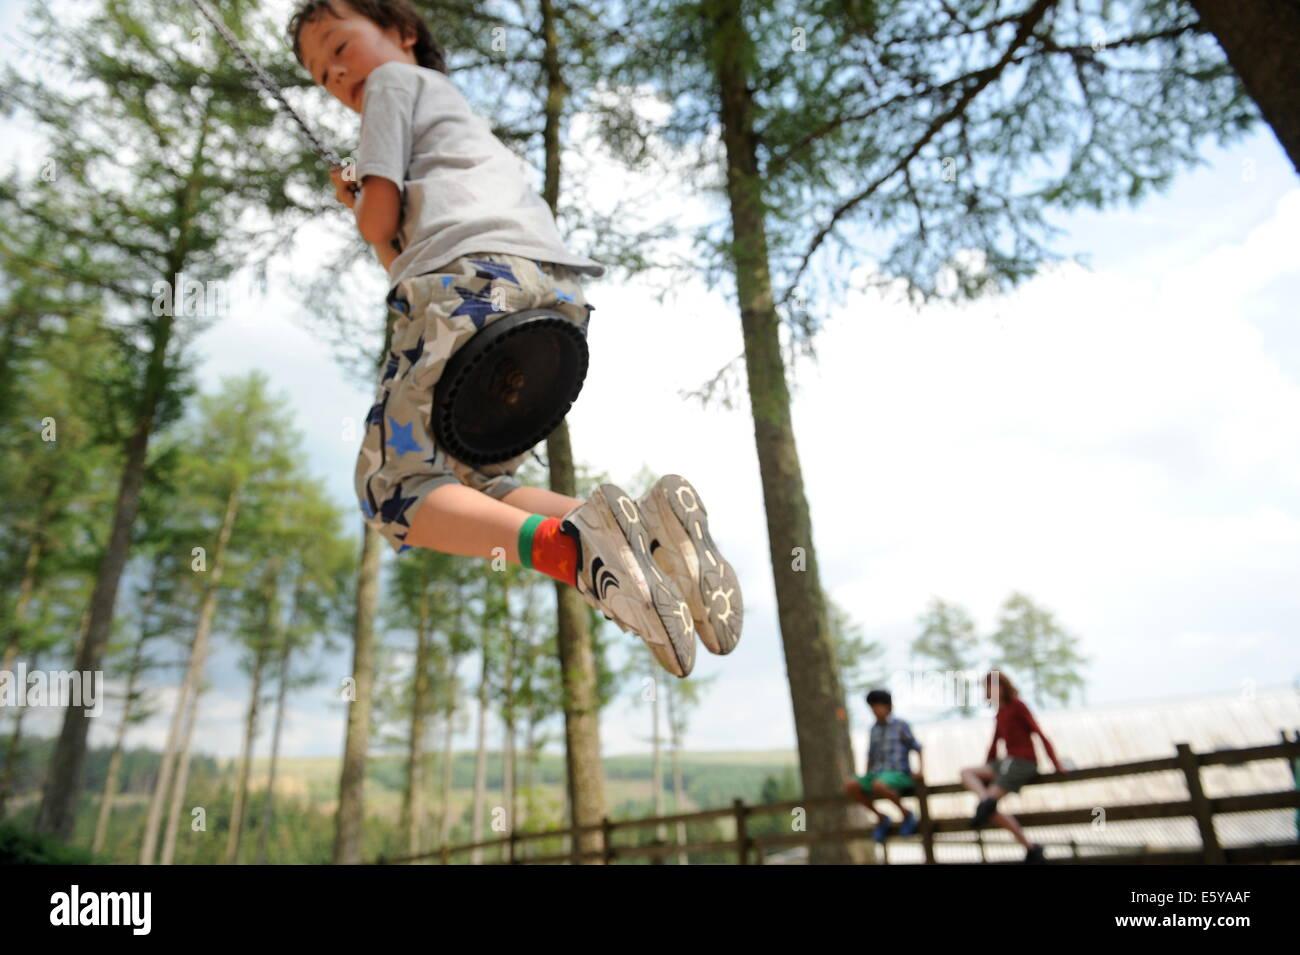 School friends swinging in the adventure park at Garwnant Forest, Powys near Merthyr Tidfil, wales Stock Photo